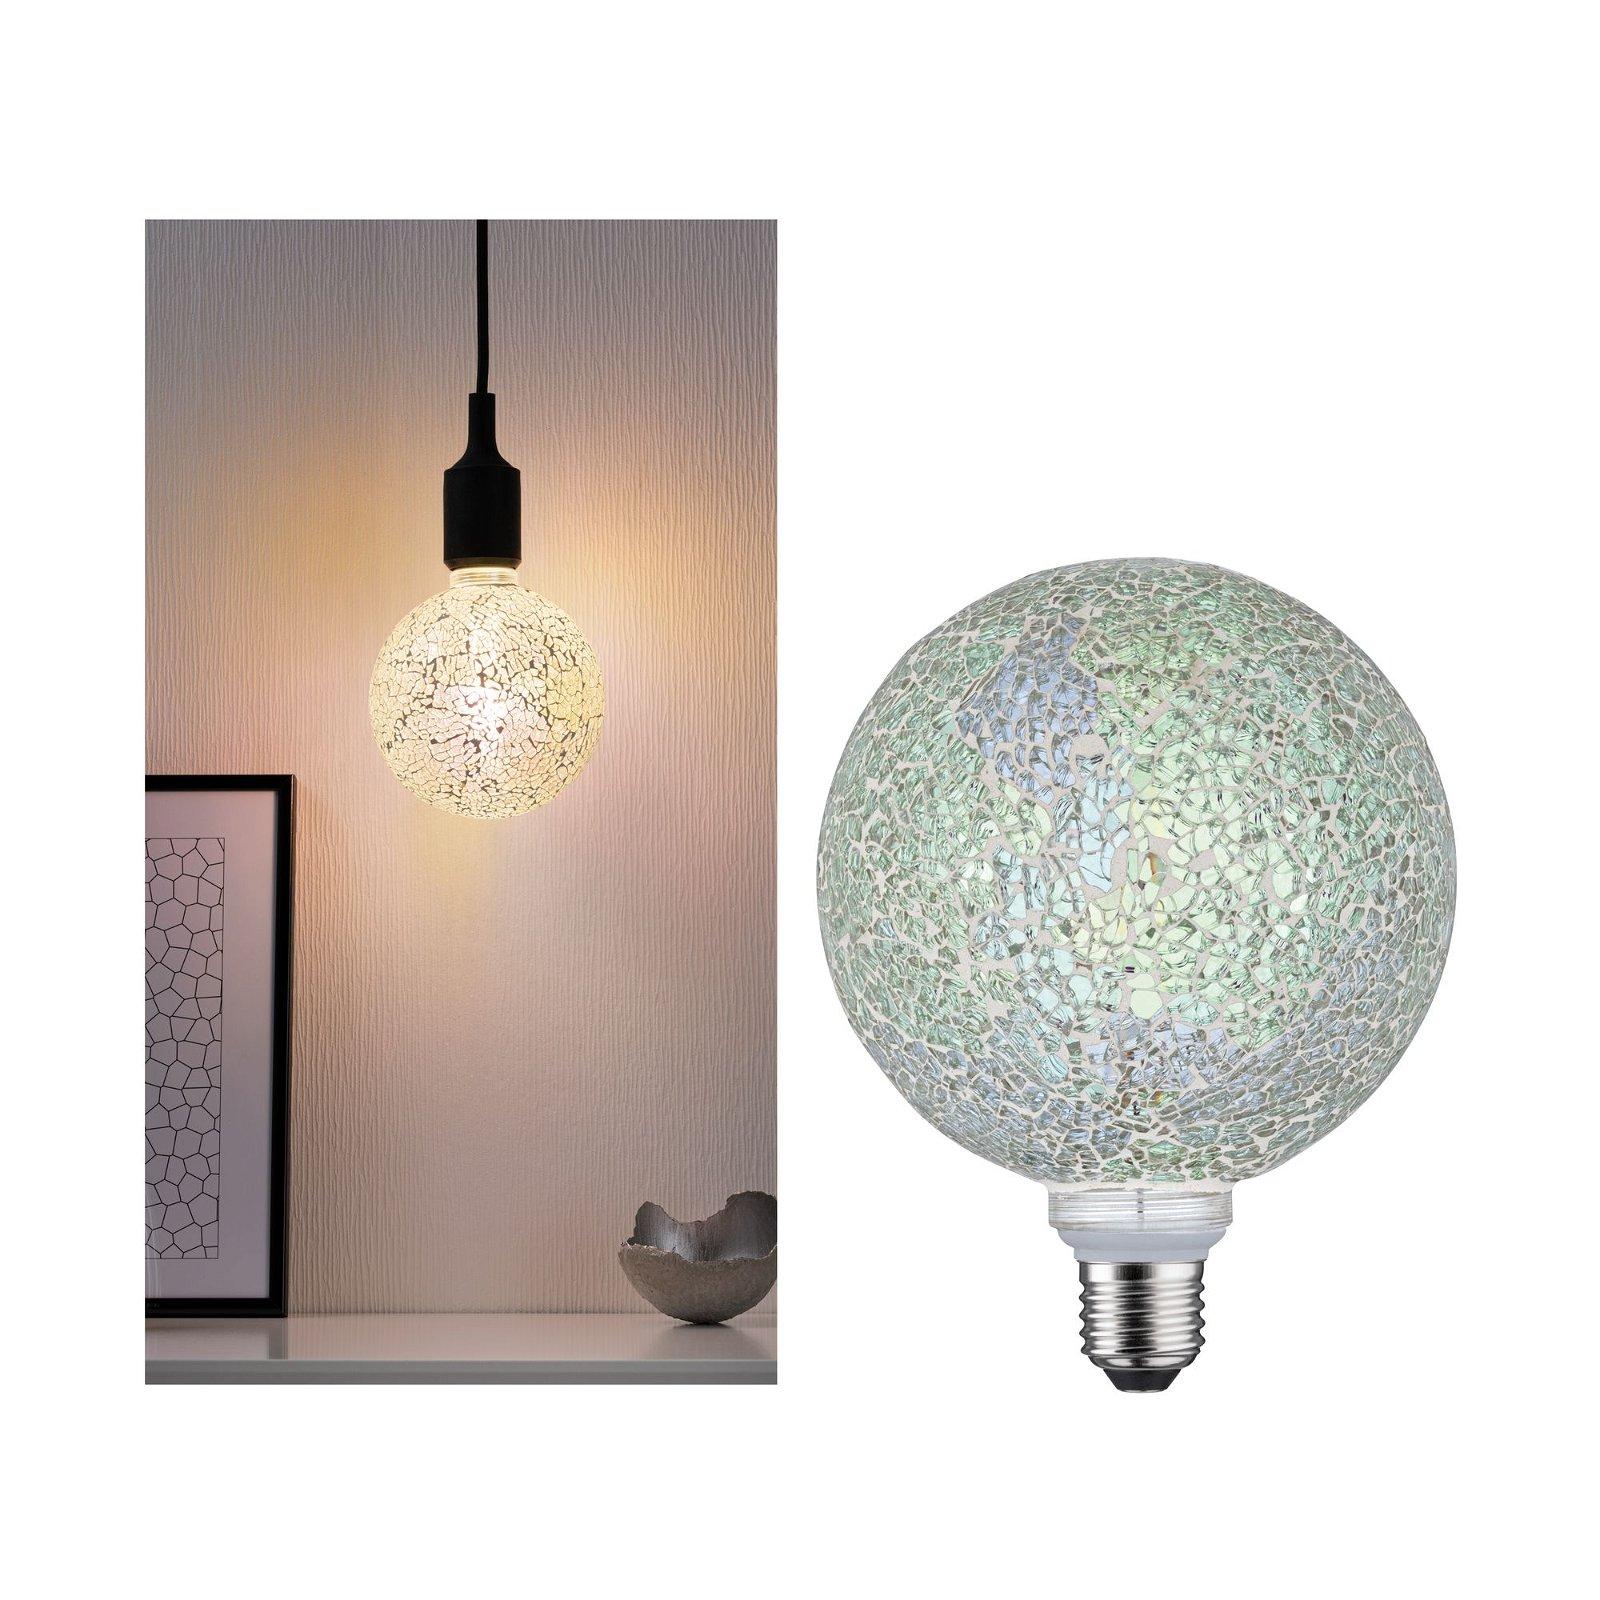 Miracle Mosaic Edition LED Globe E27 230V 470lm 5W 2700K Weiß